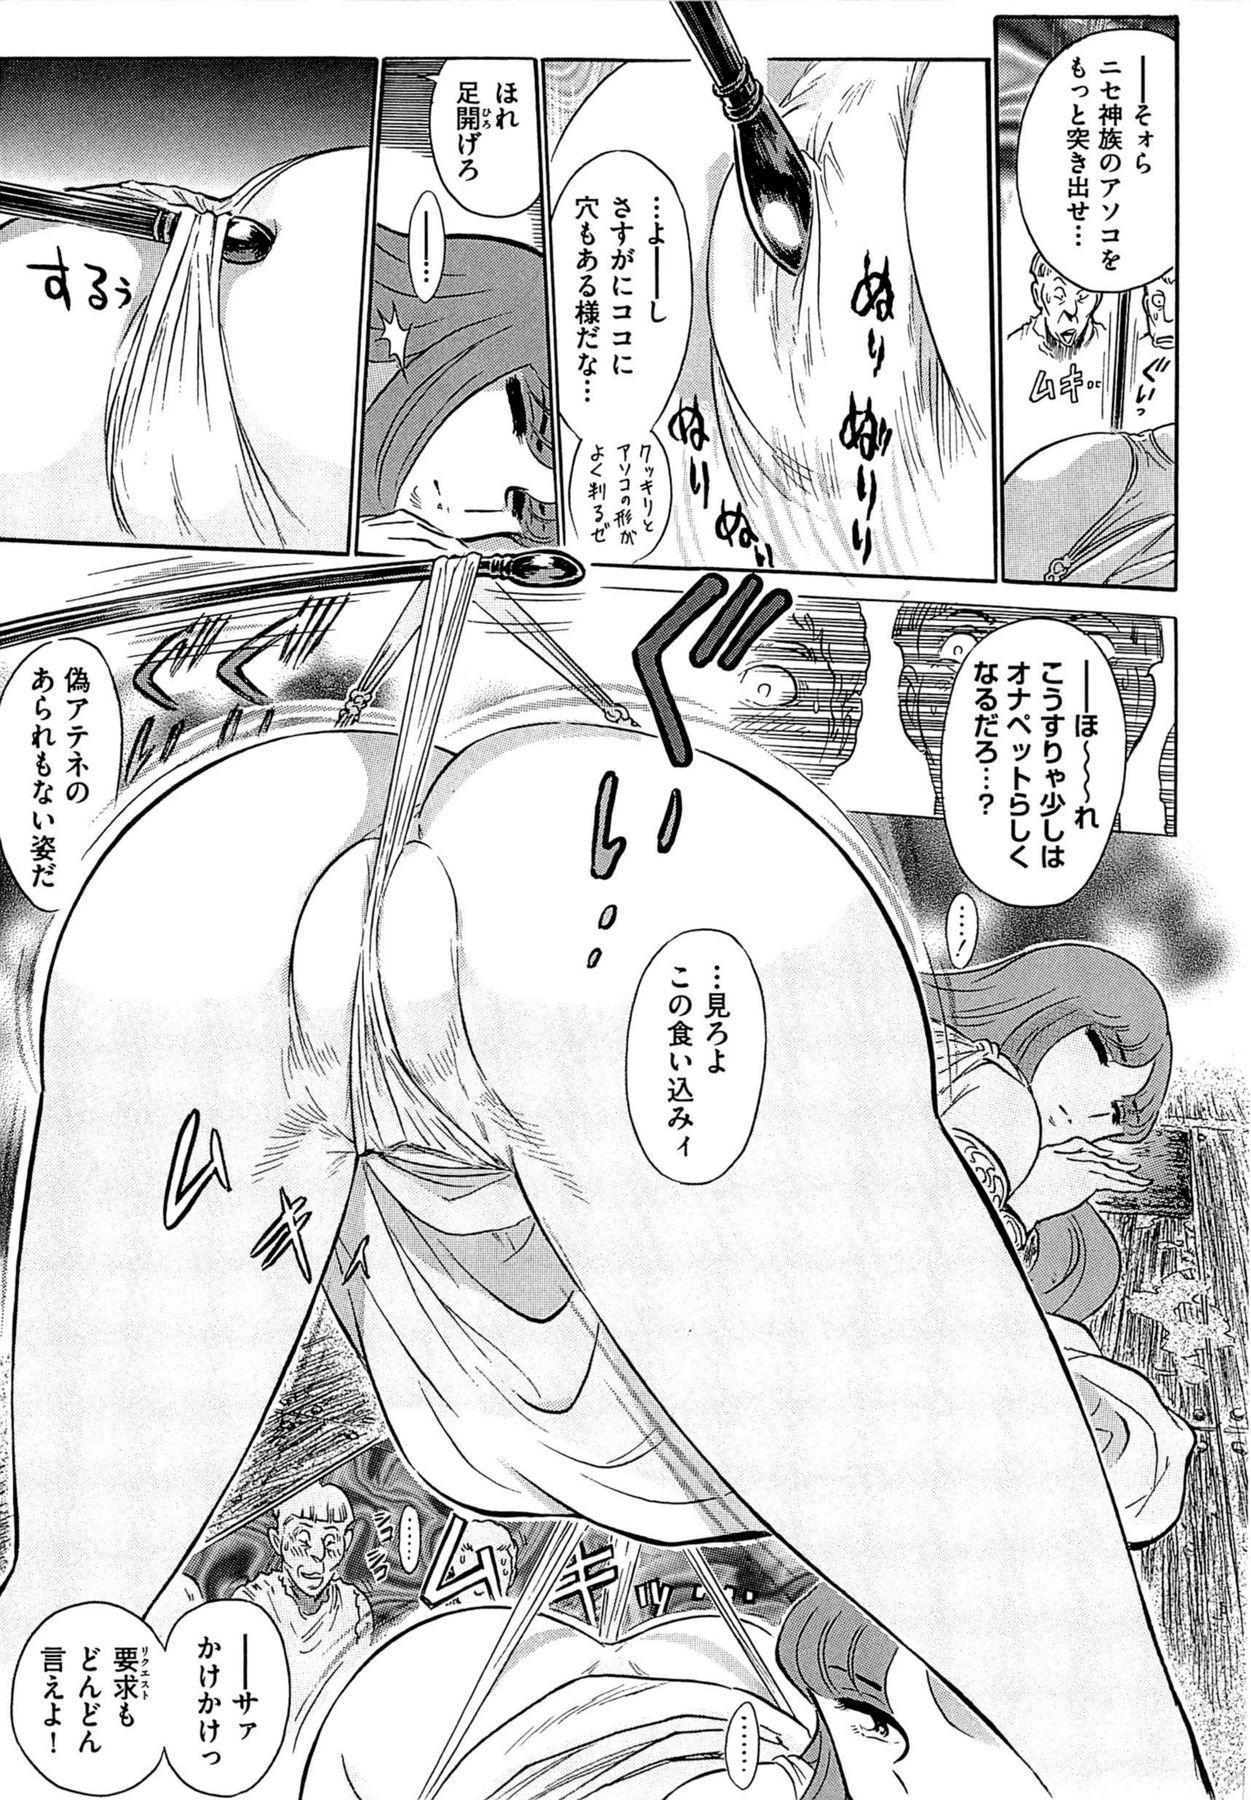 [Yosuteinu] The crysis of greece chapter 1-3 (FINAL)  - saint seiya 6